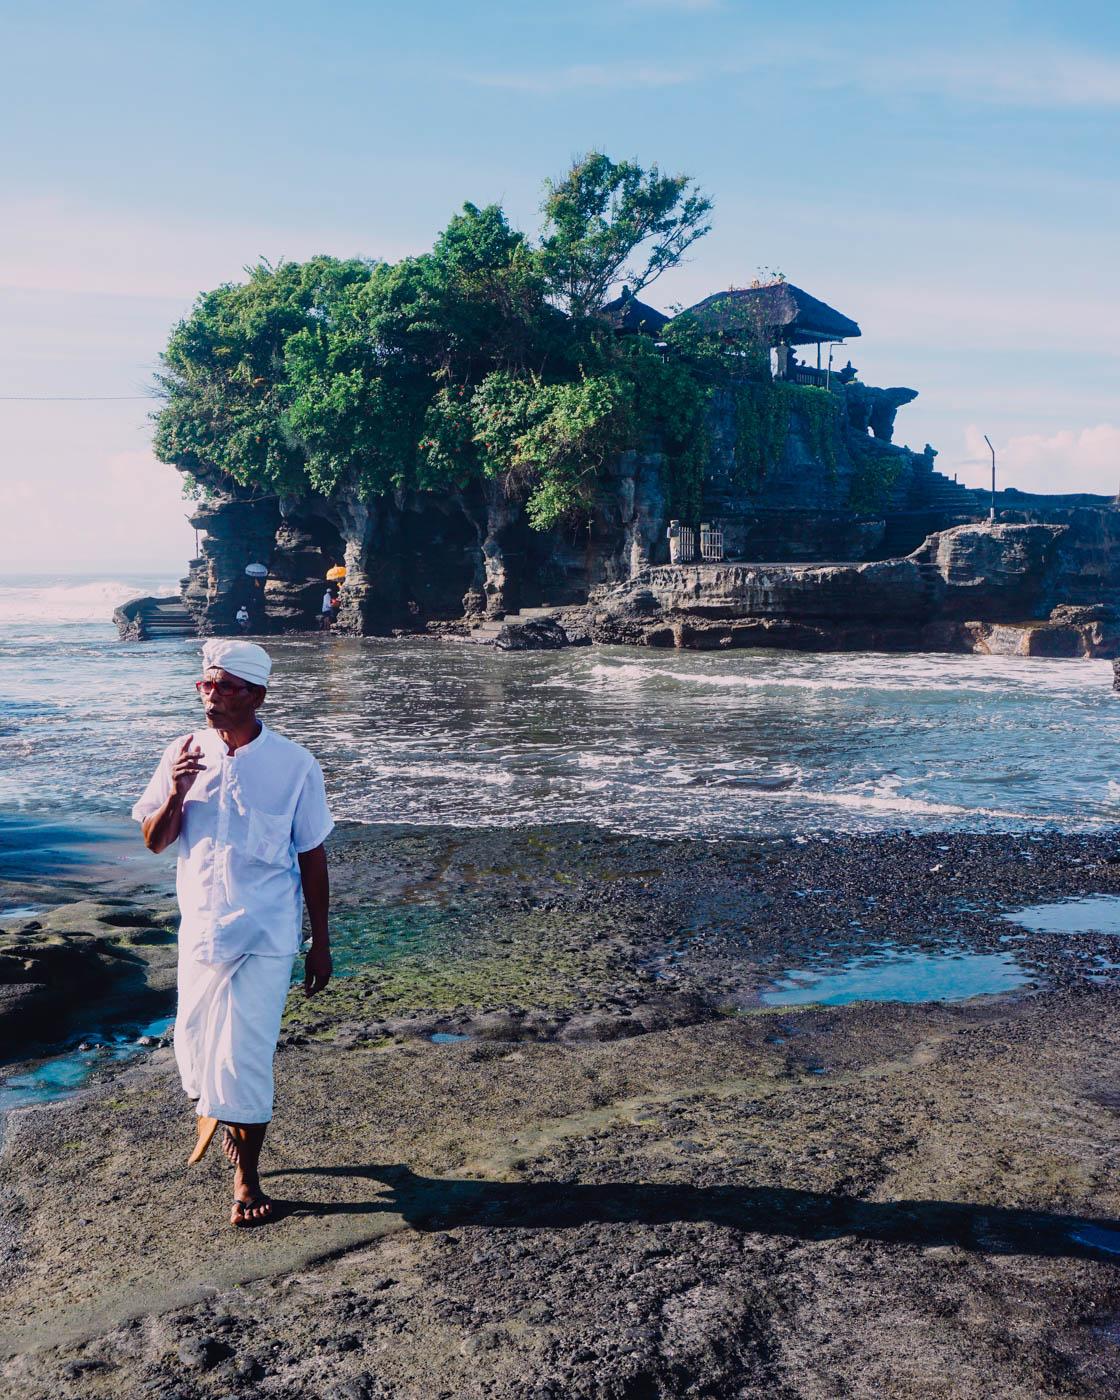 Tanah Lot - The Bali Hotel Guide I Bali Travel I Winter Sun I Indonesia I Travel #traveldestinations #traveltips #bali #indonesia-1